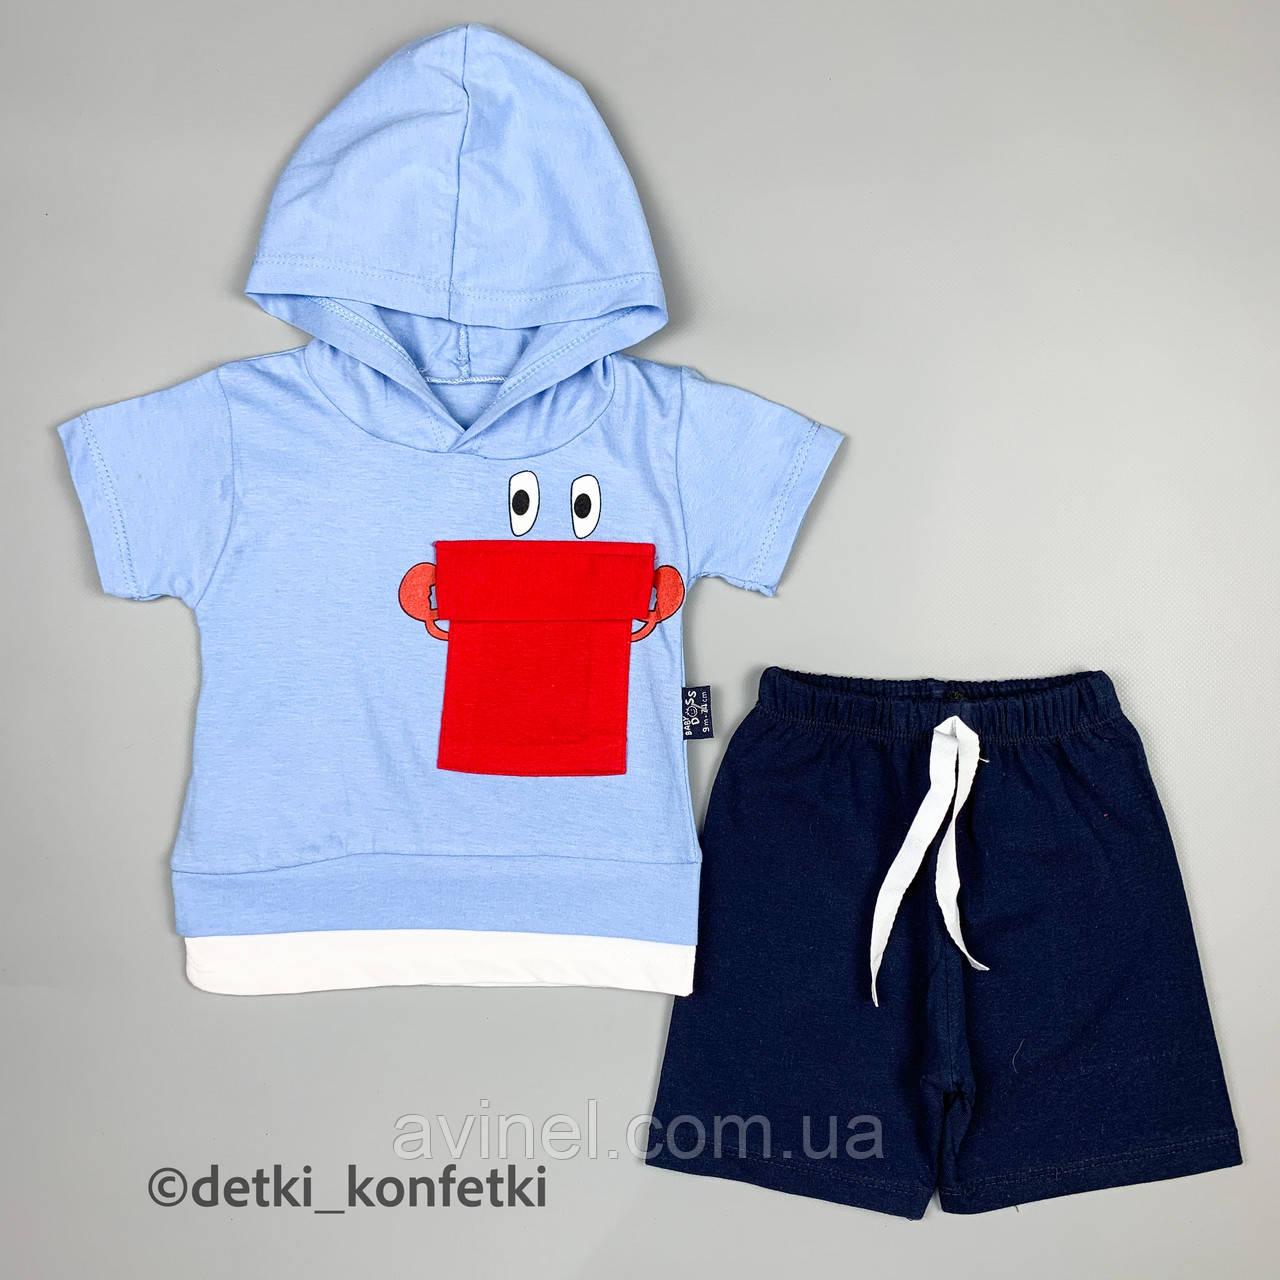 Комплект футболка, шорты голубой Интерлок Babydadoss Турция 74 (р) 86